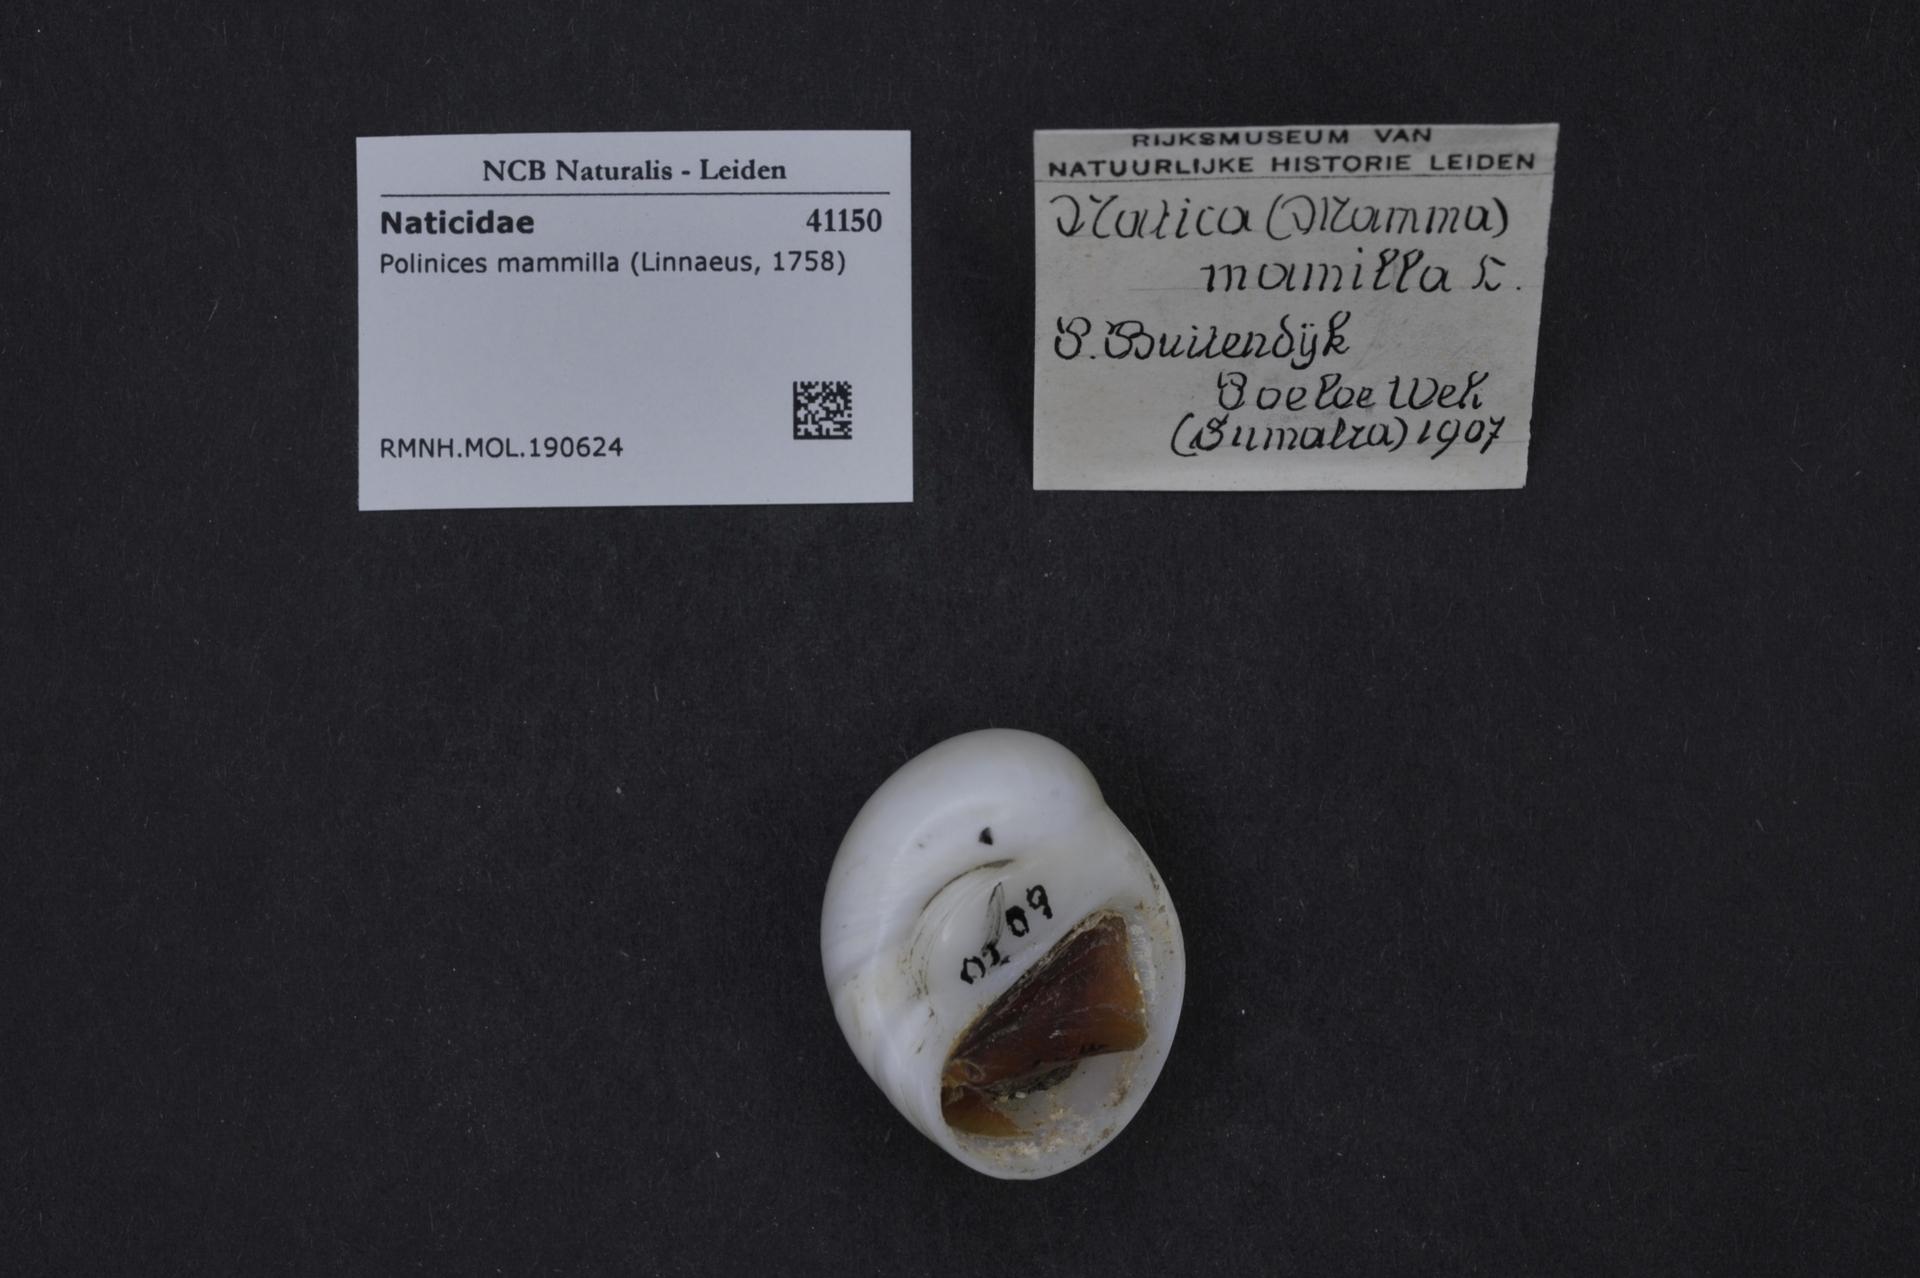 RMNH.MOL.190624 | Polinices mammilla (Linnaeus, 1758)